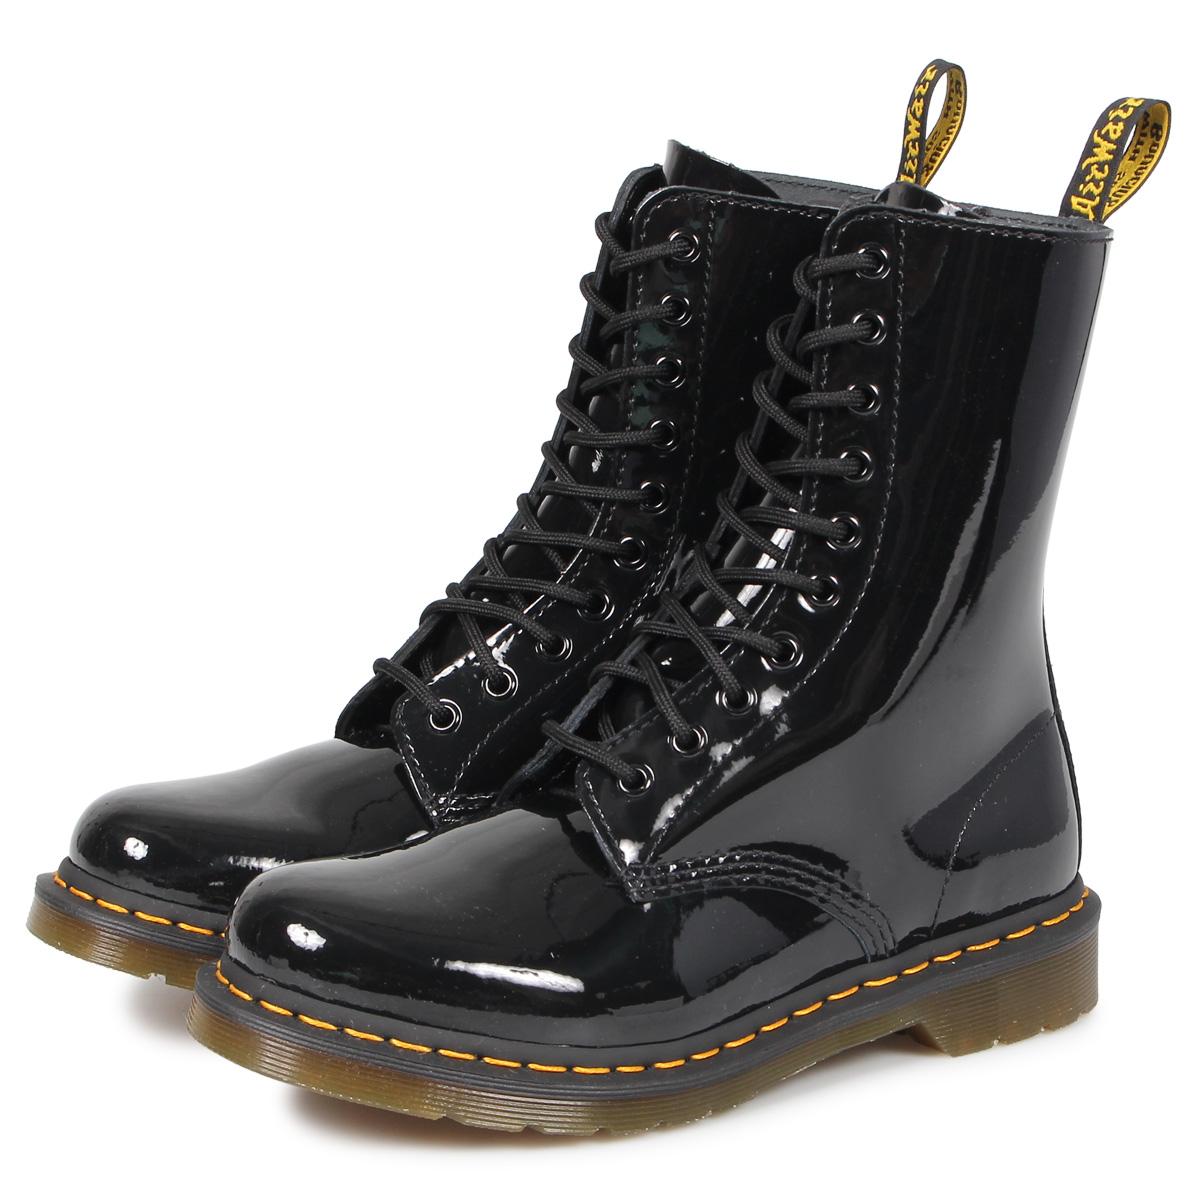 Dr.Martens 1490 W PATENT LAMPER 10EYE BOOT ドクターマーチン 10ホール ブーツ メンズ レディース ブラック 黒 R25277001